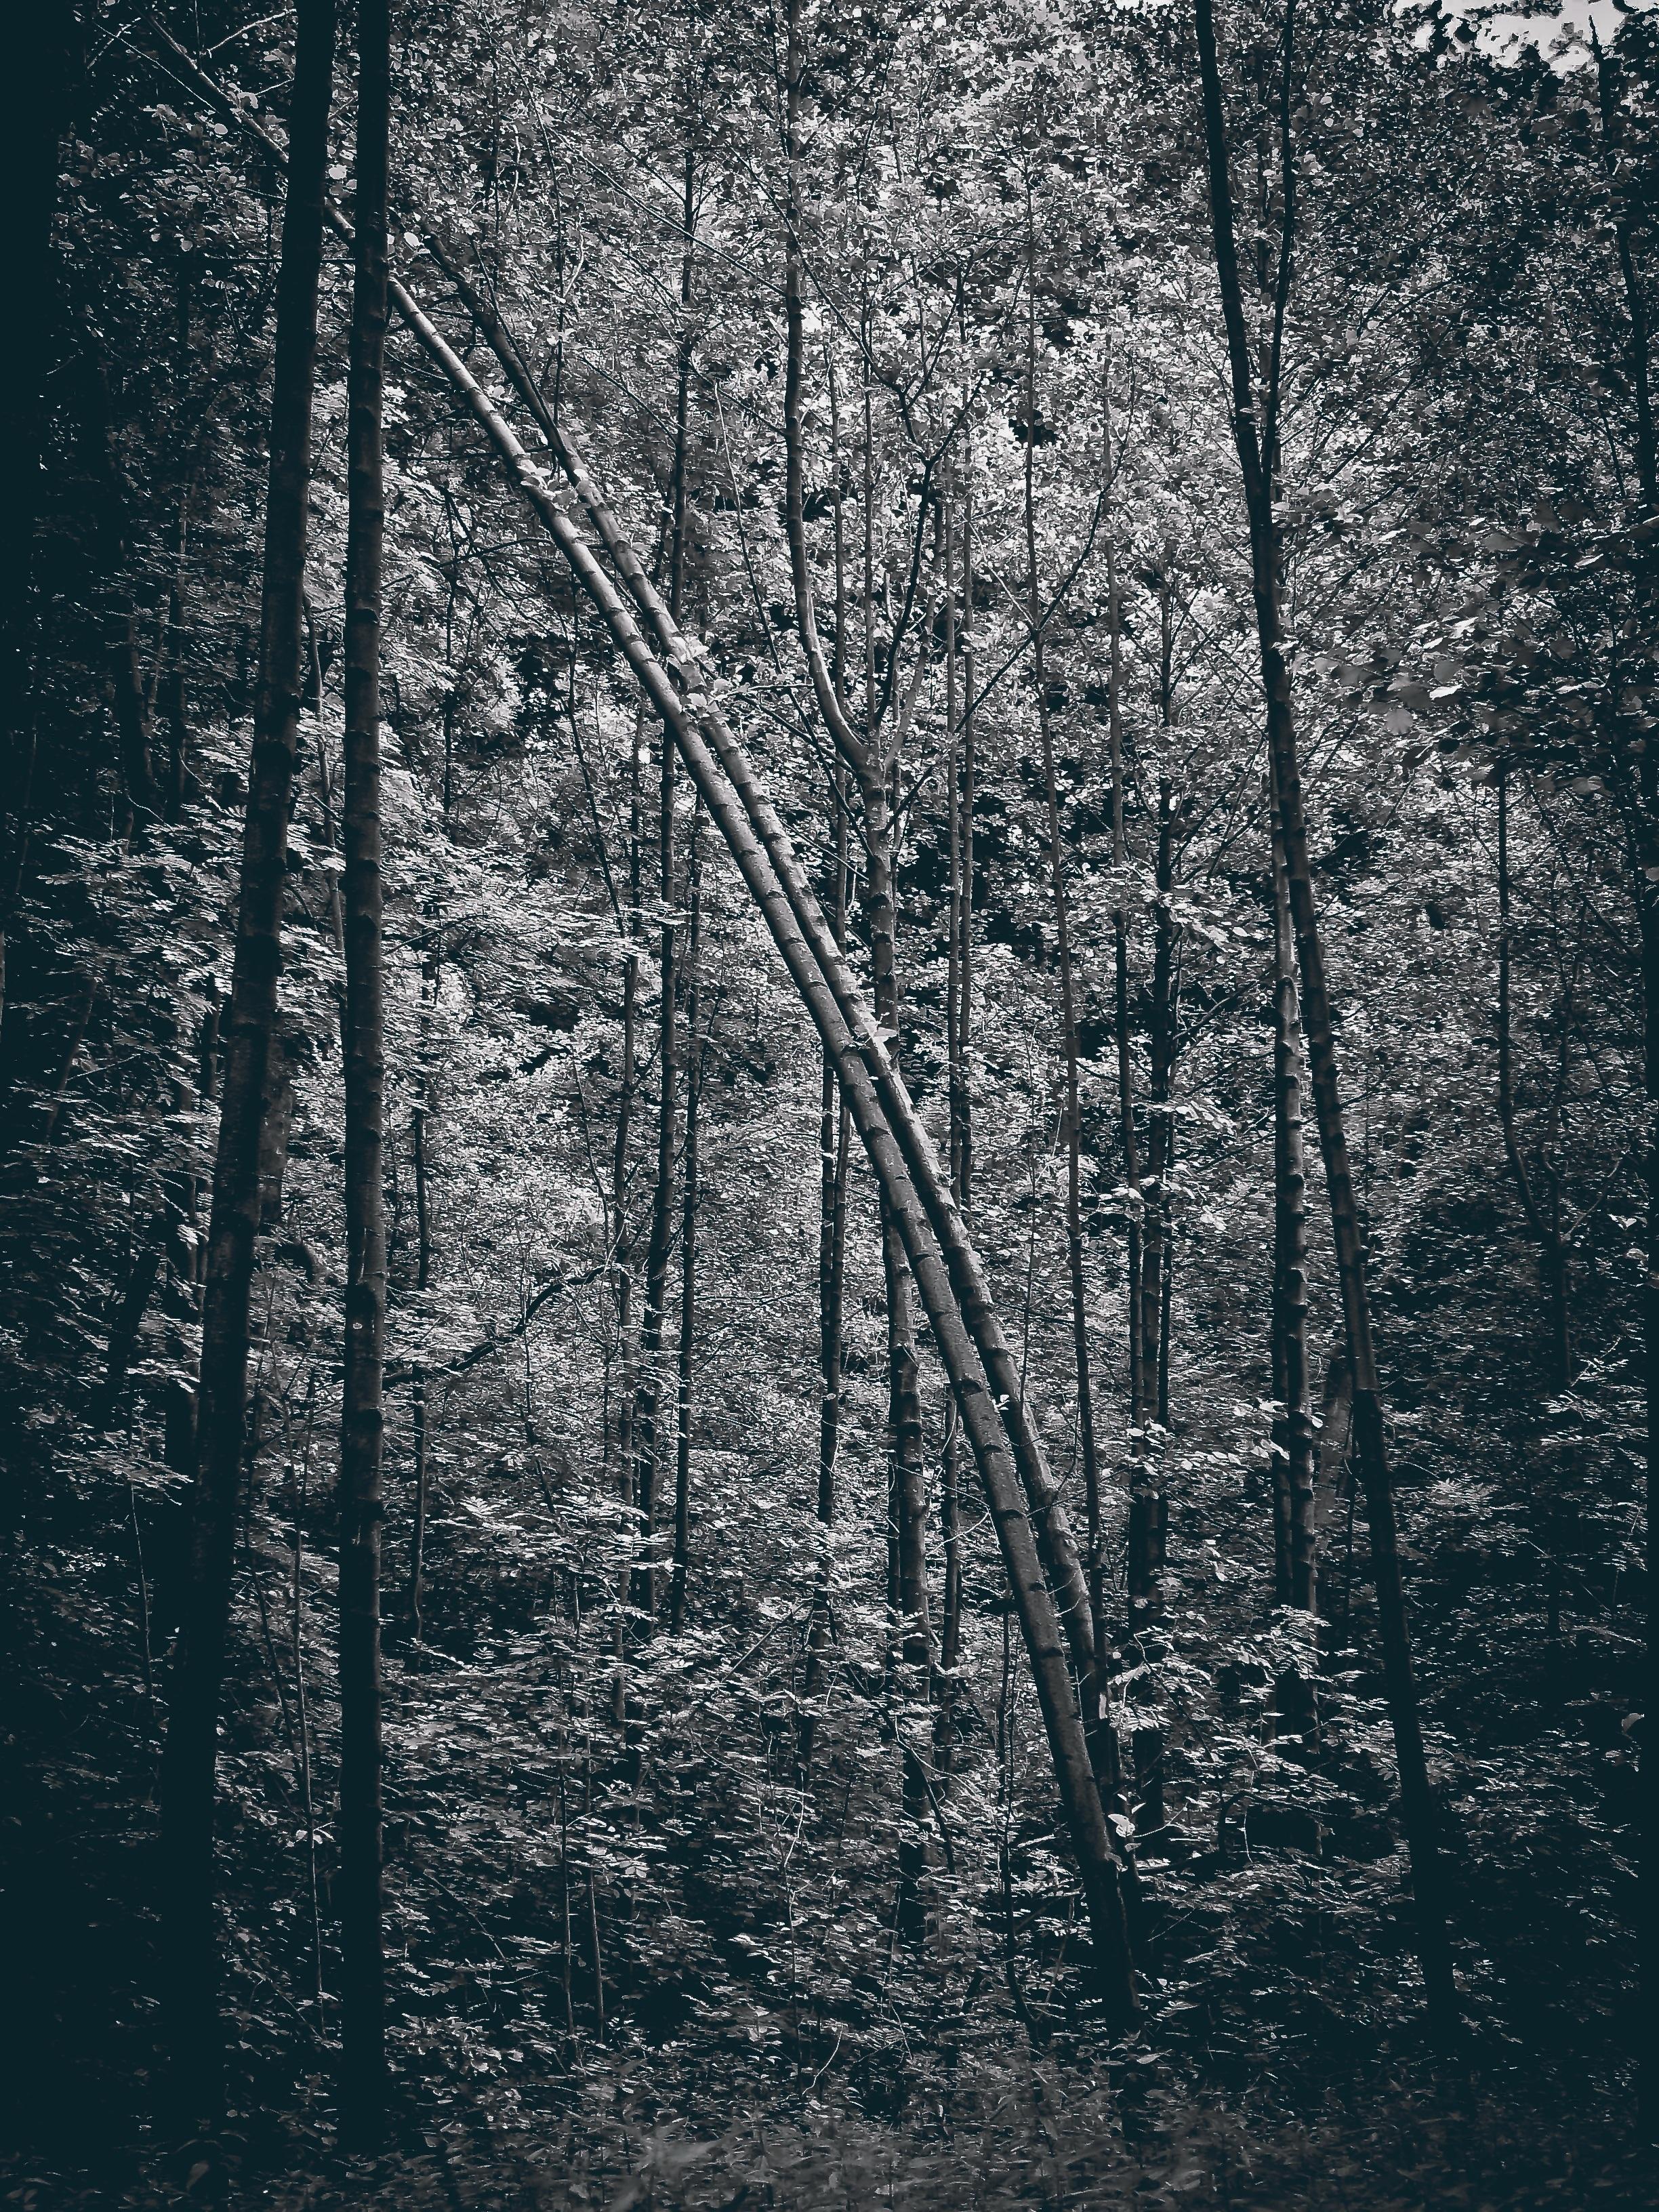 Gambar Pemandangan Pohon Alam Hutan Cabang Salju Musim Dingin Hitam Dan Putih Menanam Kabut Daun Embun Beku Mistik Gelap Malam Cuaca Kegelapan Satu Warna Estetis Ranting Aneh Suram Monggol Daerah Berhutan